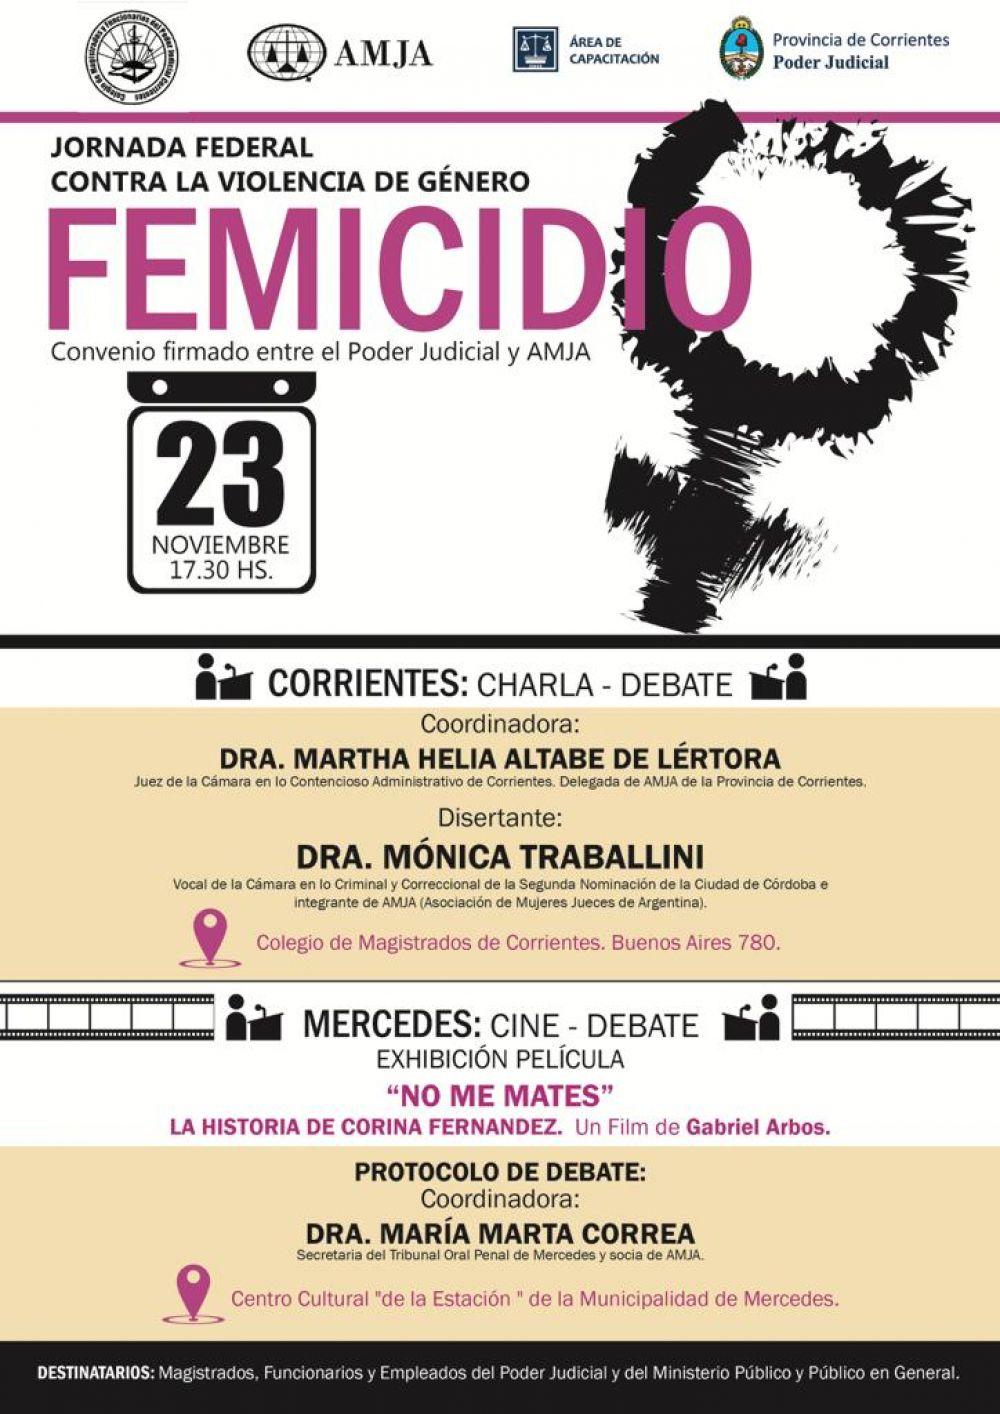 foto: AMJA invita a la Jornada Federal contra la Violencia de Género